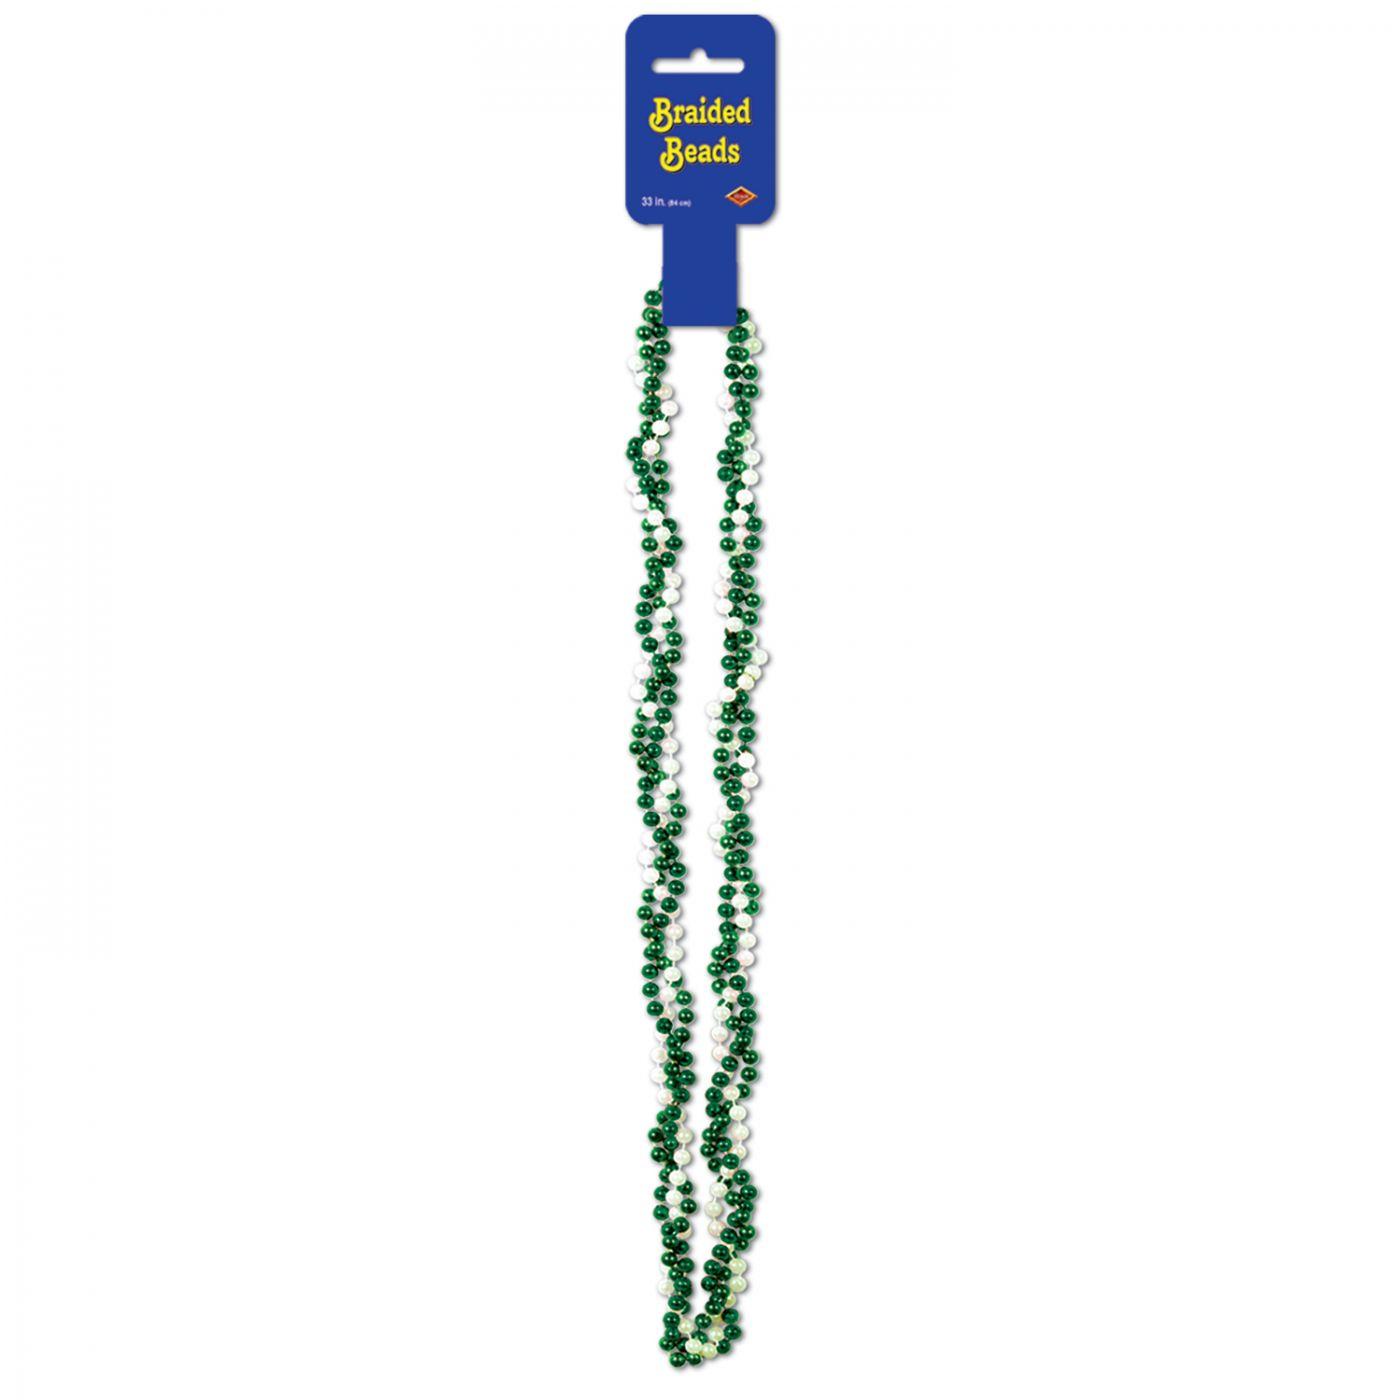 Image of Braided Beads